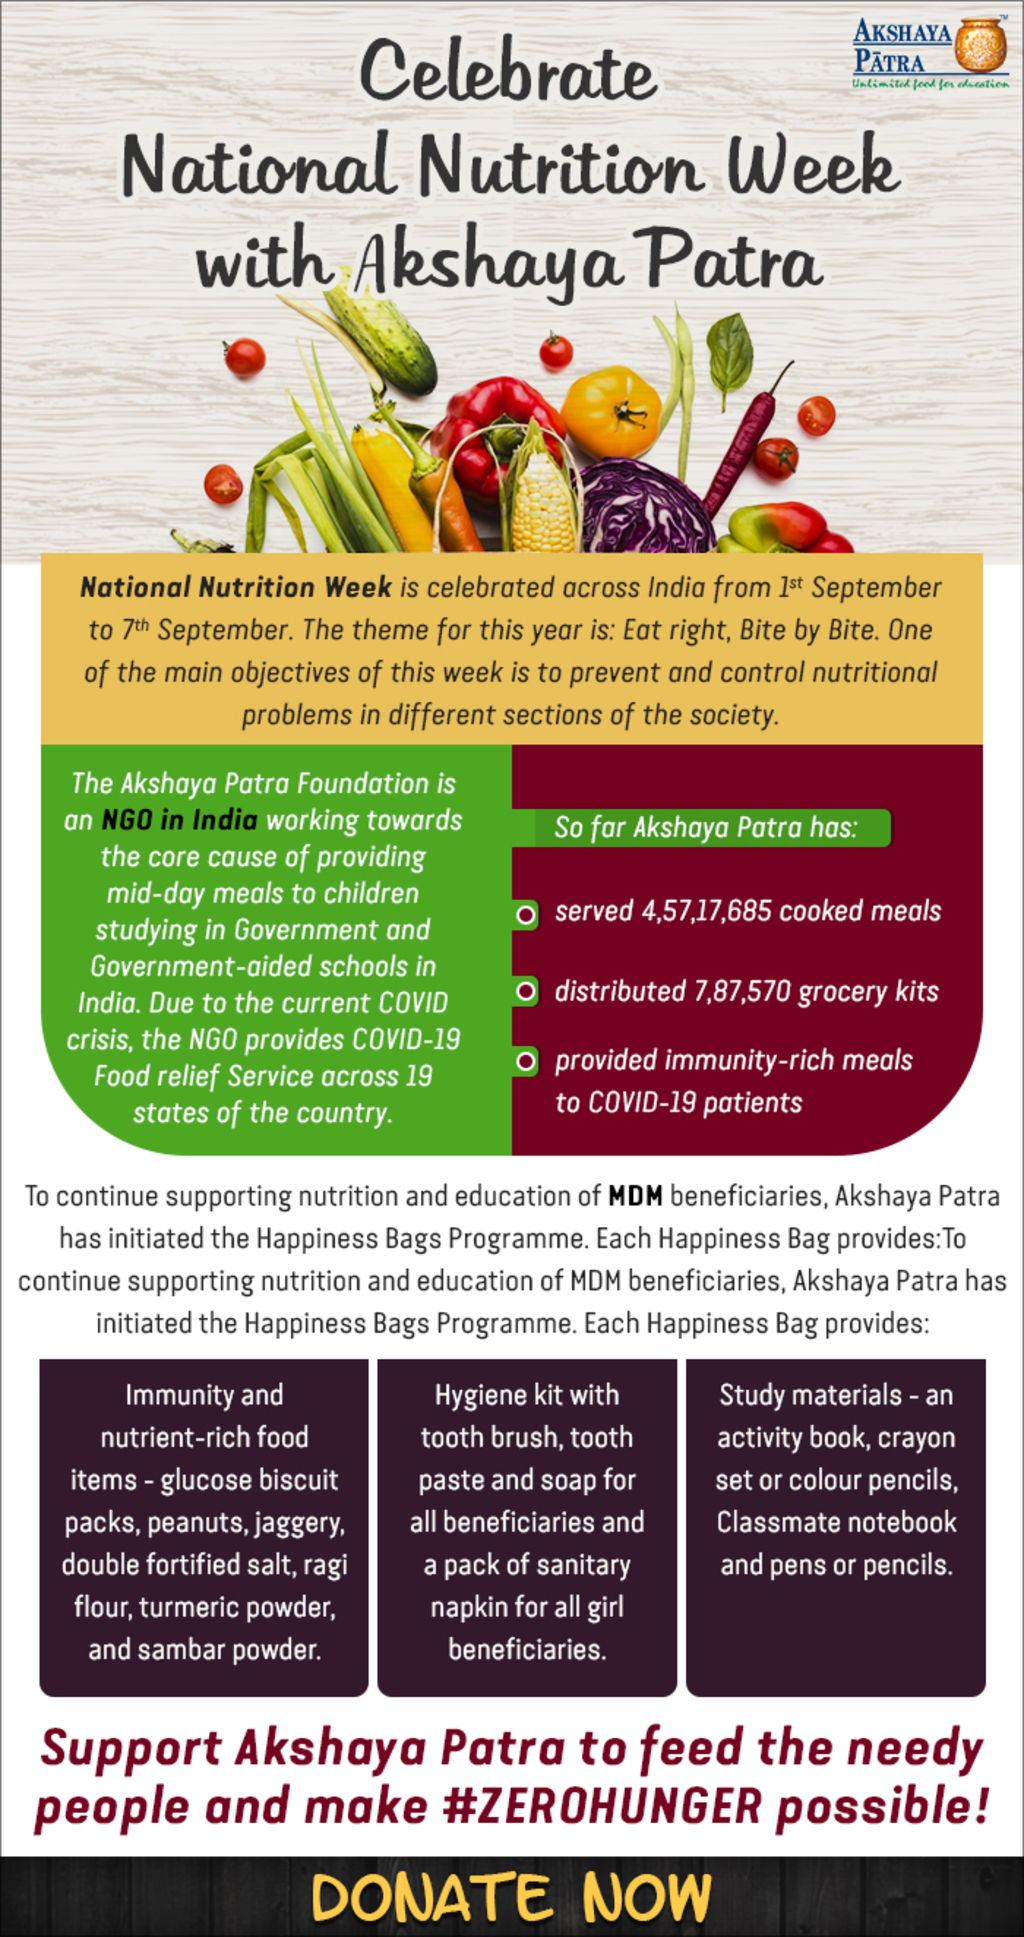 Celebrate National Nutrition Week with Akshaya Patra via Akshaya Patra